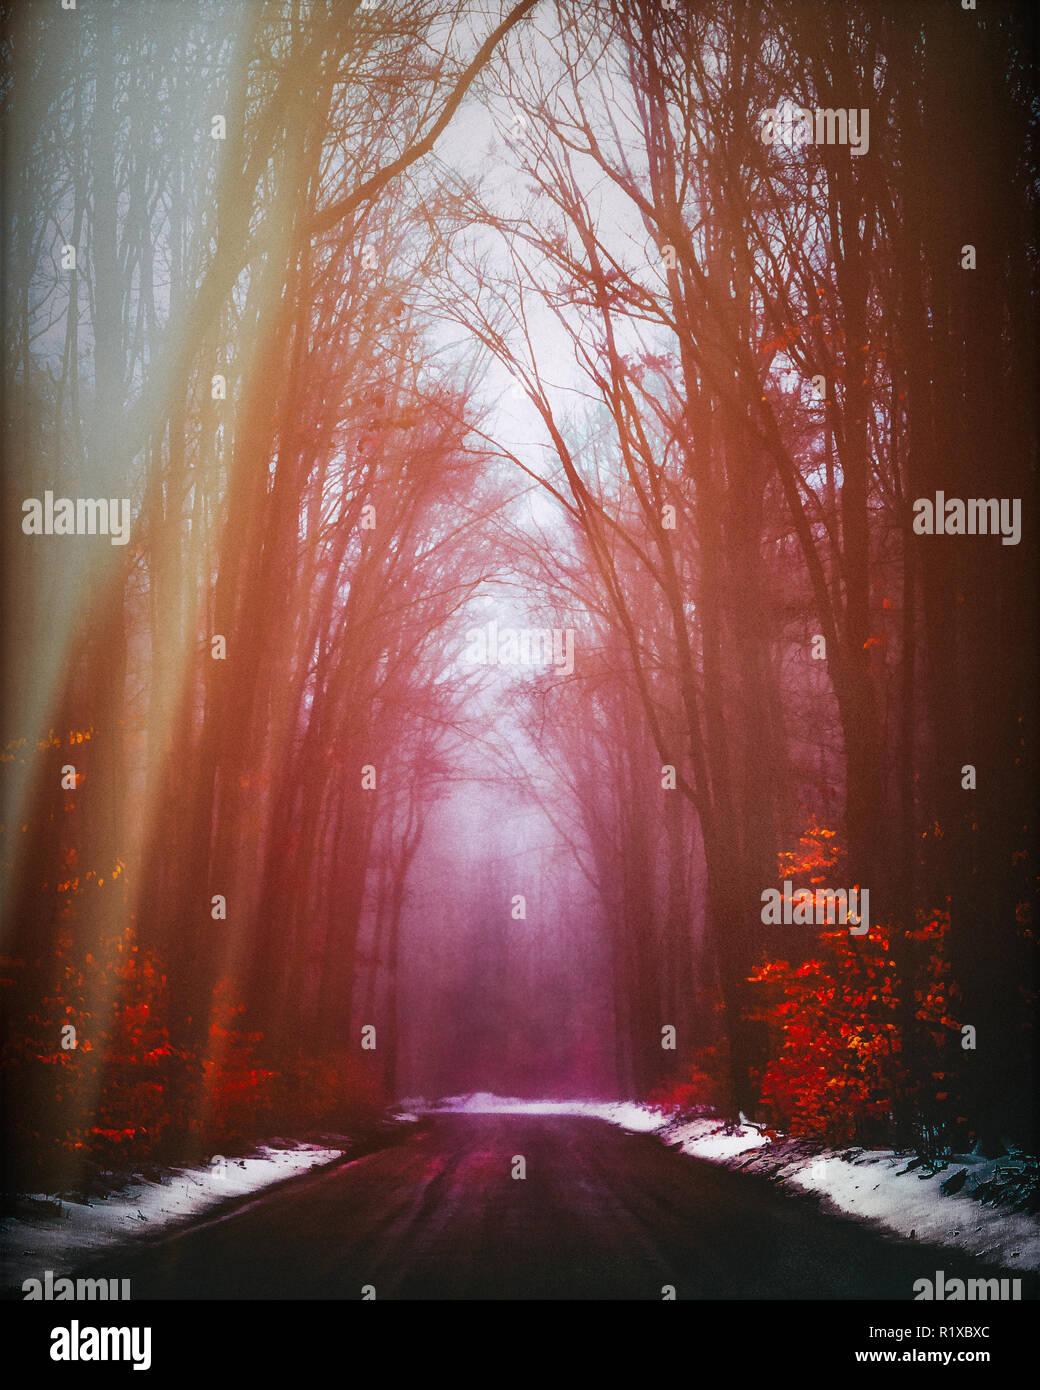 Seasonal Country Road. Dream-like Mood. - Stock Image